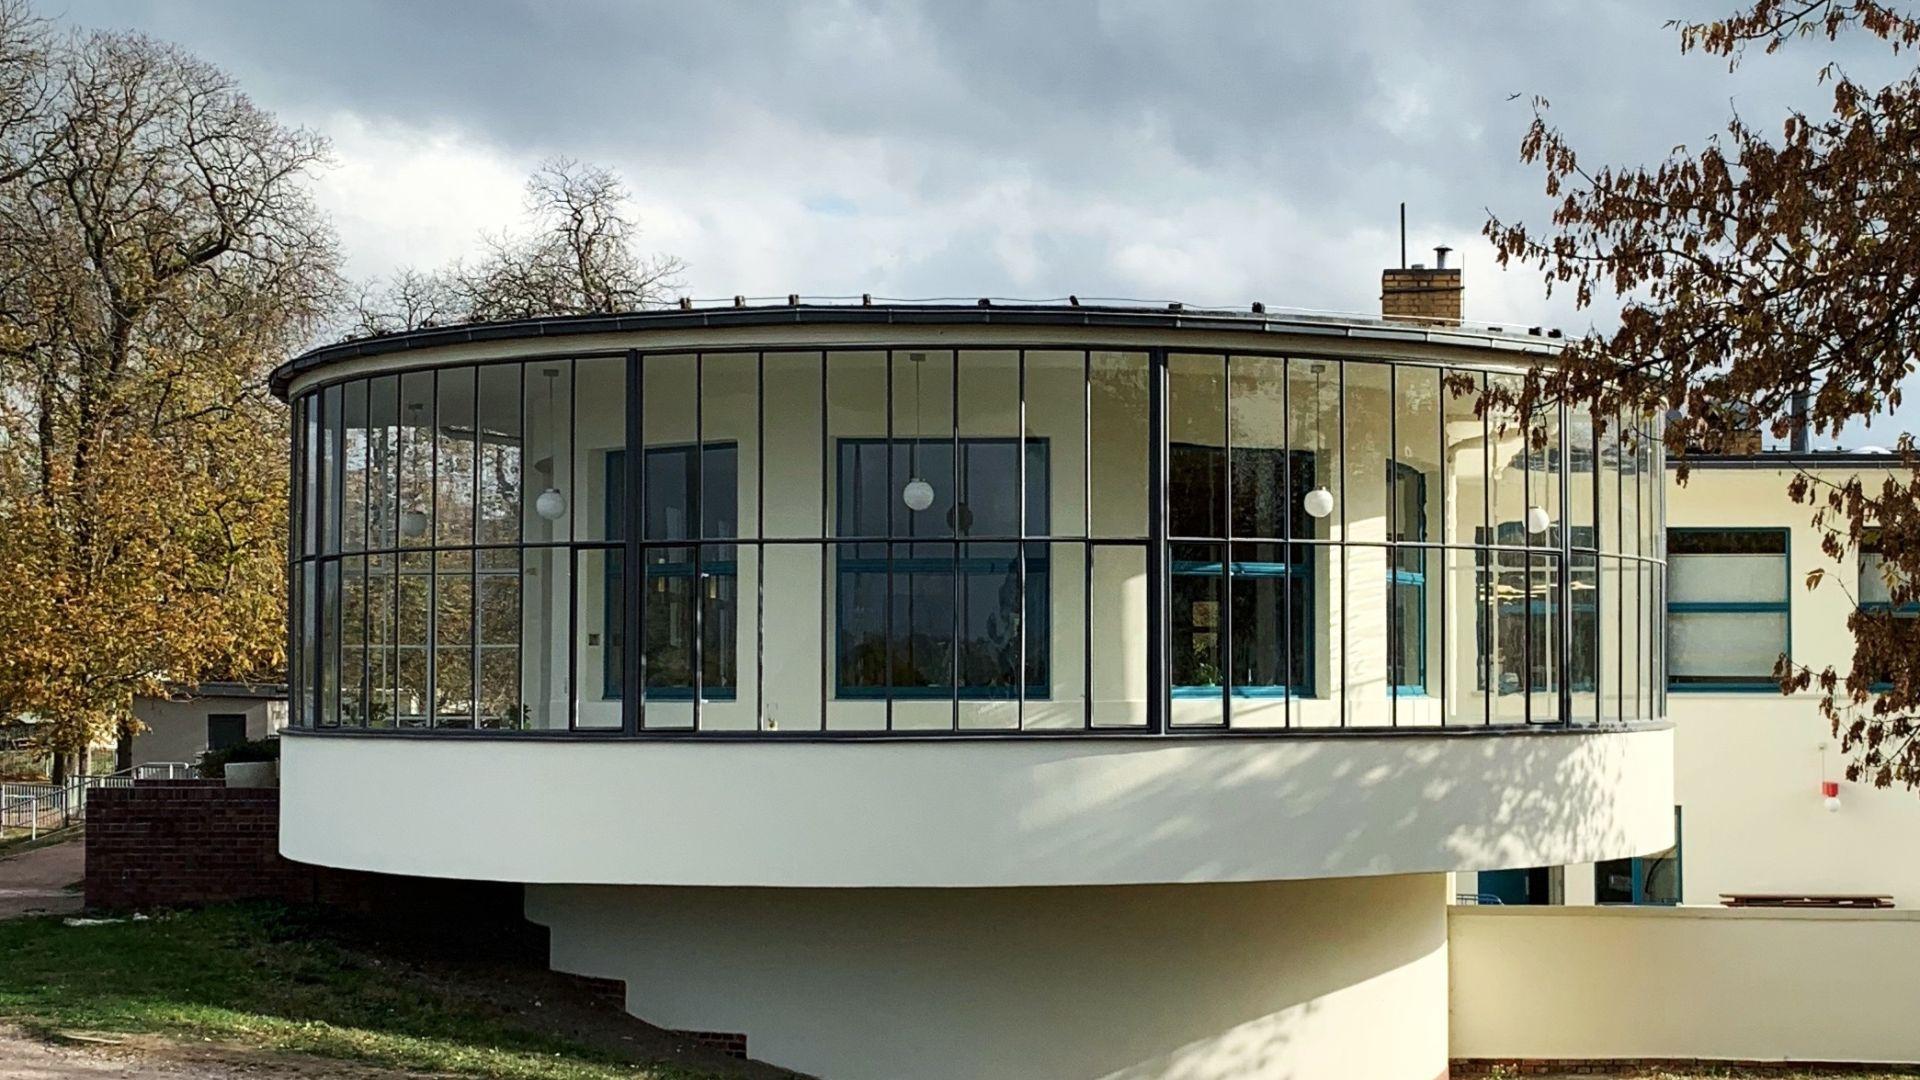 Dessau: Kornhouse, Dessau Roßlau, Architect: Carl Fieger, 1929/30